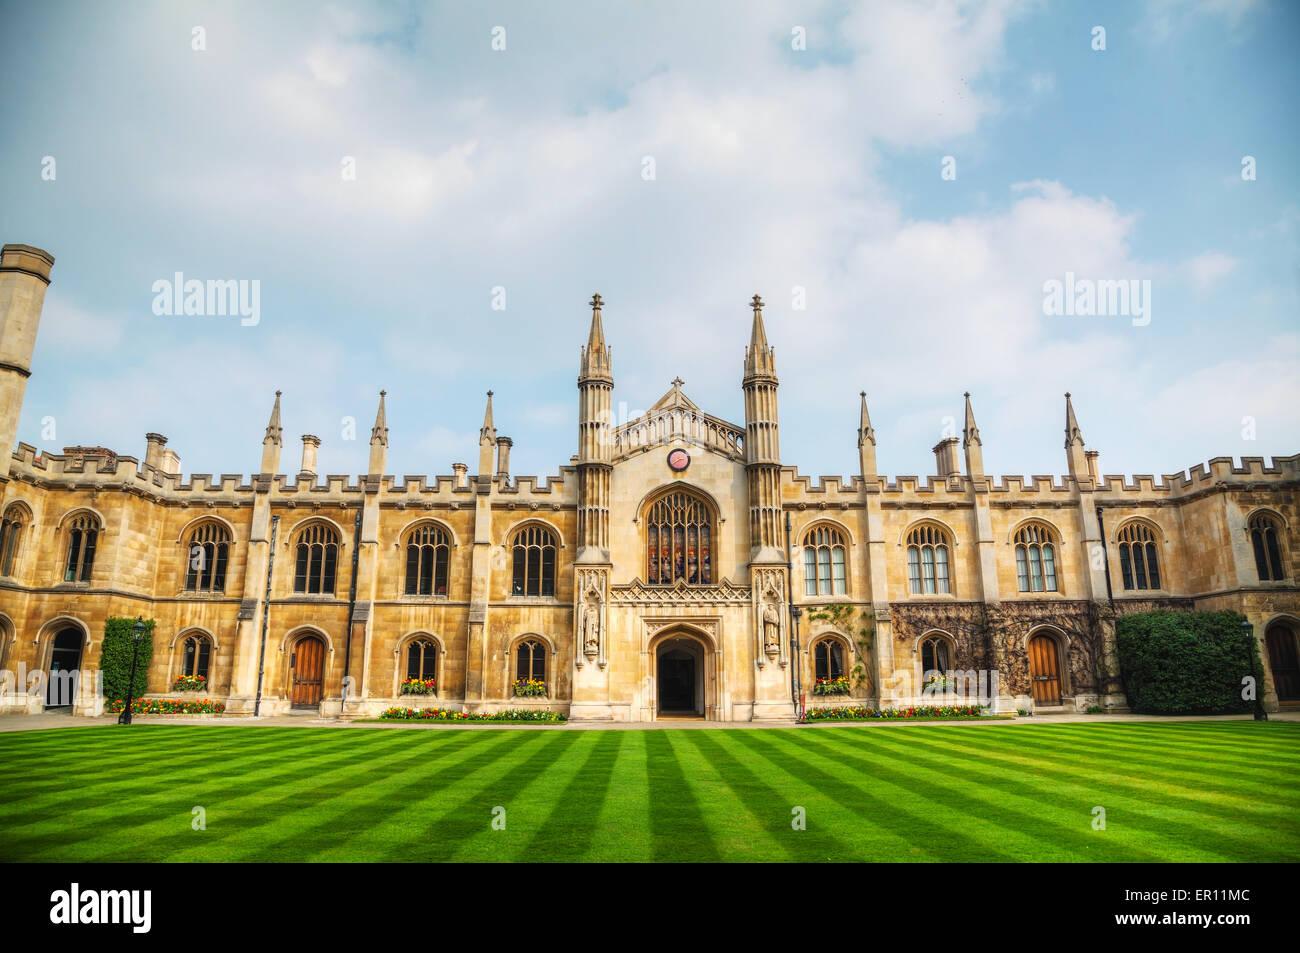 CAMBRIDGE, UK - APRIL 9: Courtyard of the Corpus Christi College on April 9, 2015 in Cambridge, UK. - Stock Image